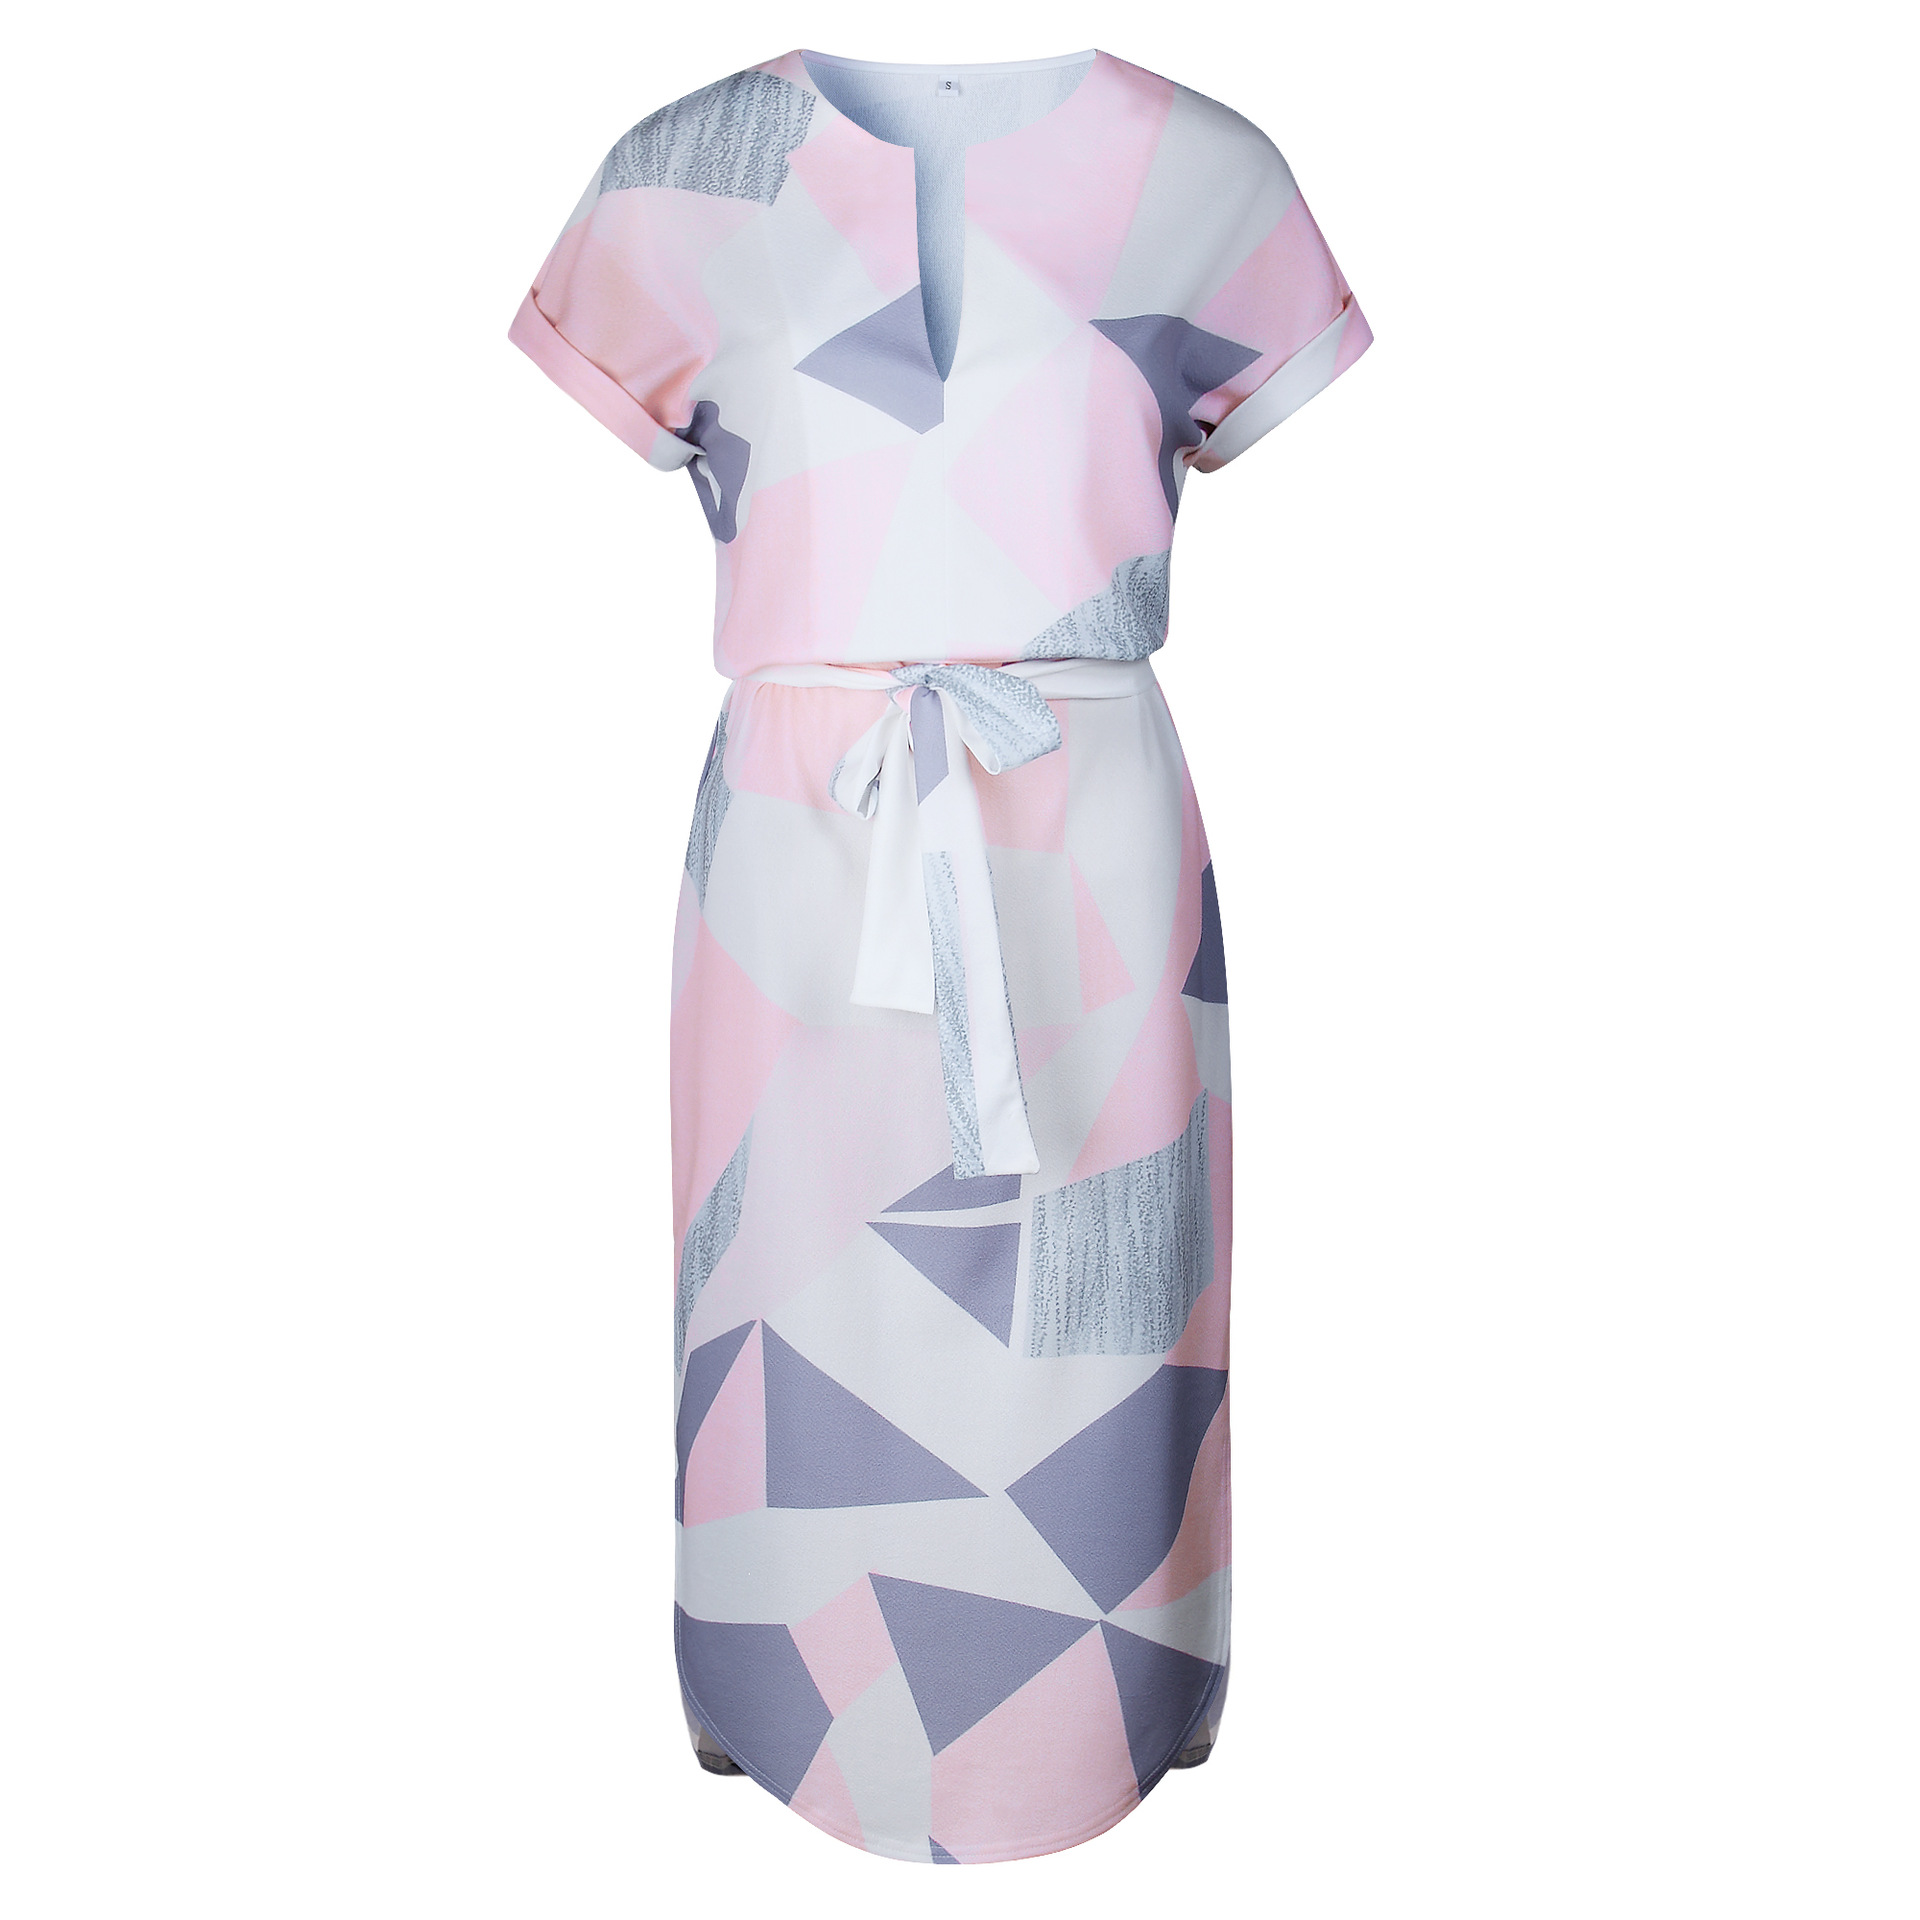 2018 Summer Dress Women Print V Neck Short Sleeve Robe Female Dresses Casual Sashes Midi Dress Ladies Elegant Vestidos Dropship 48